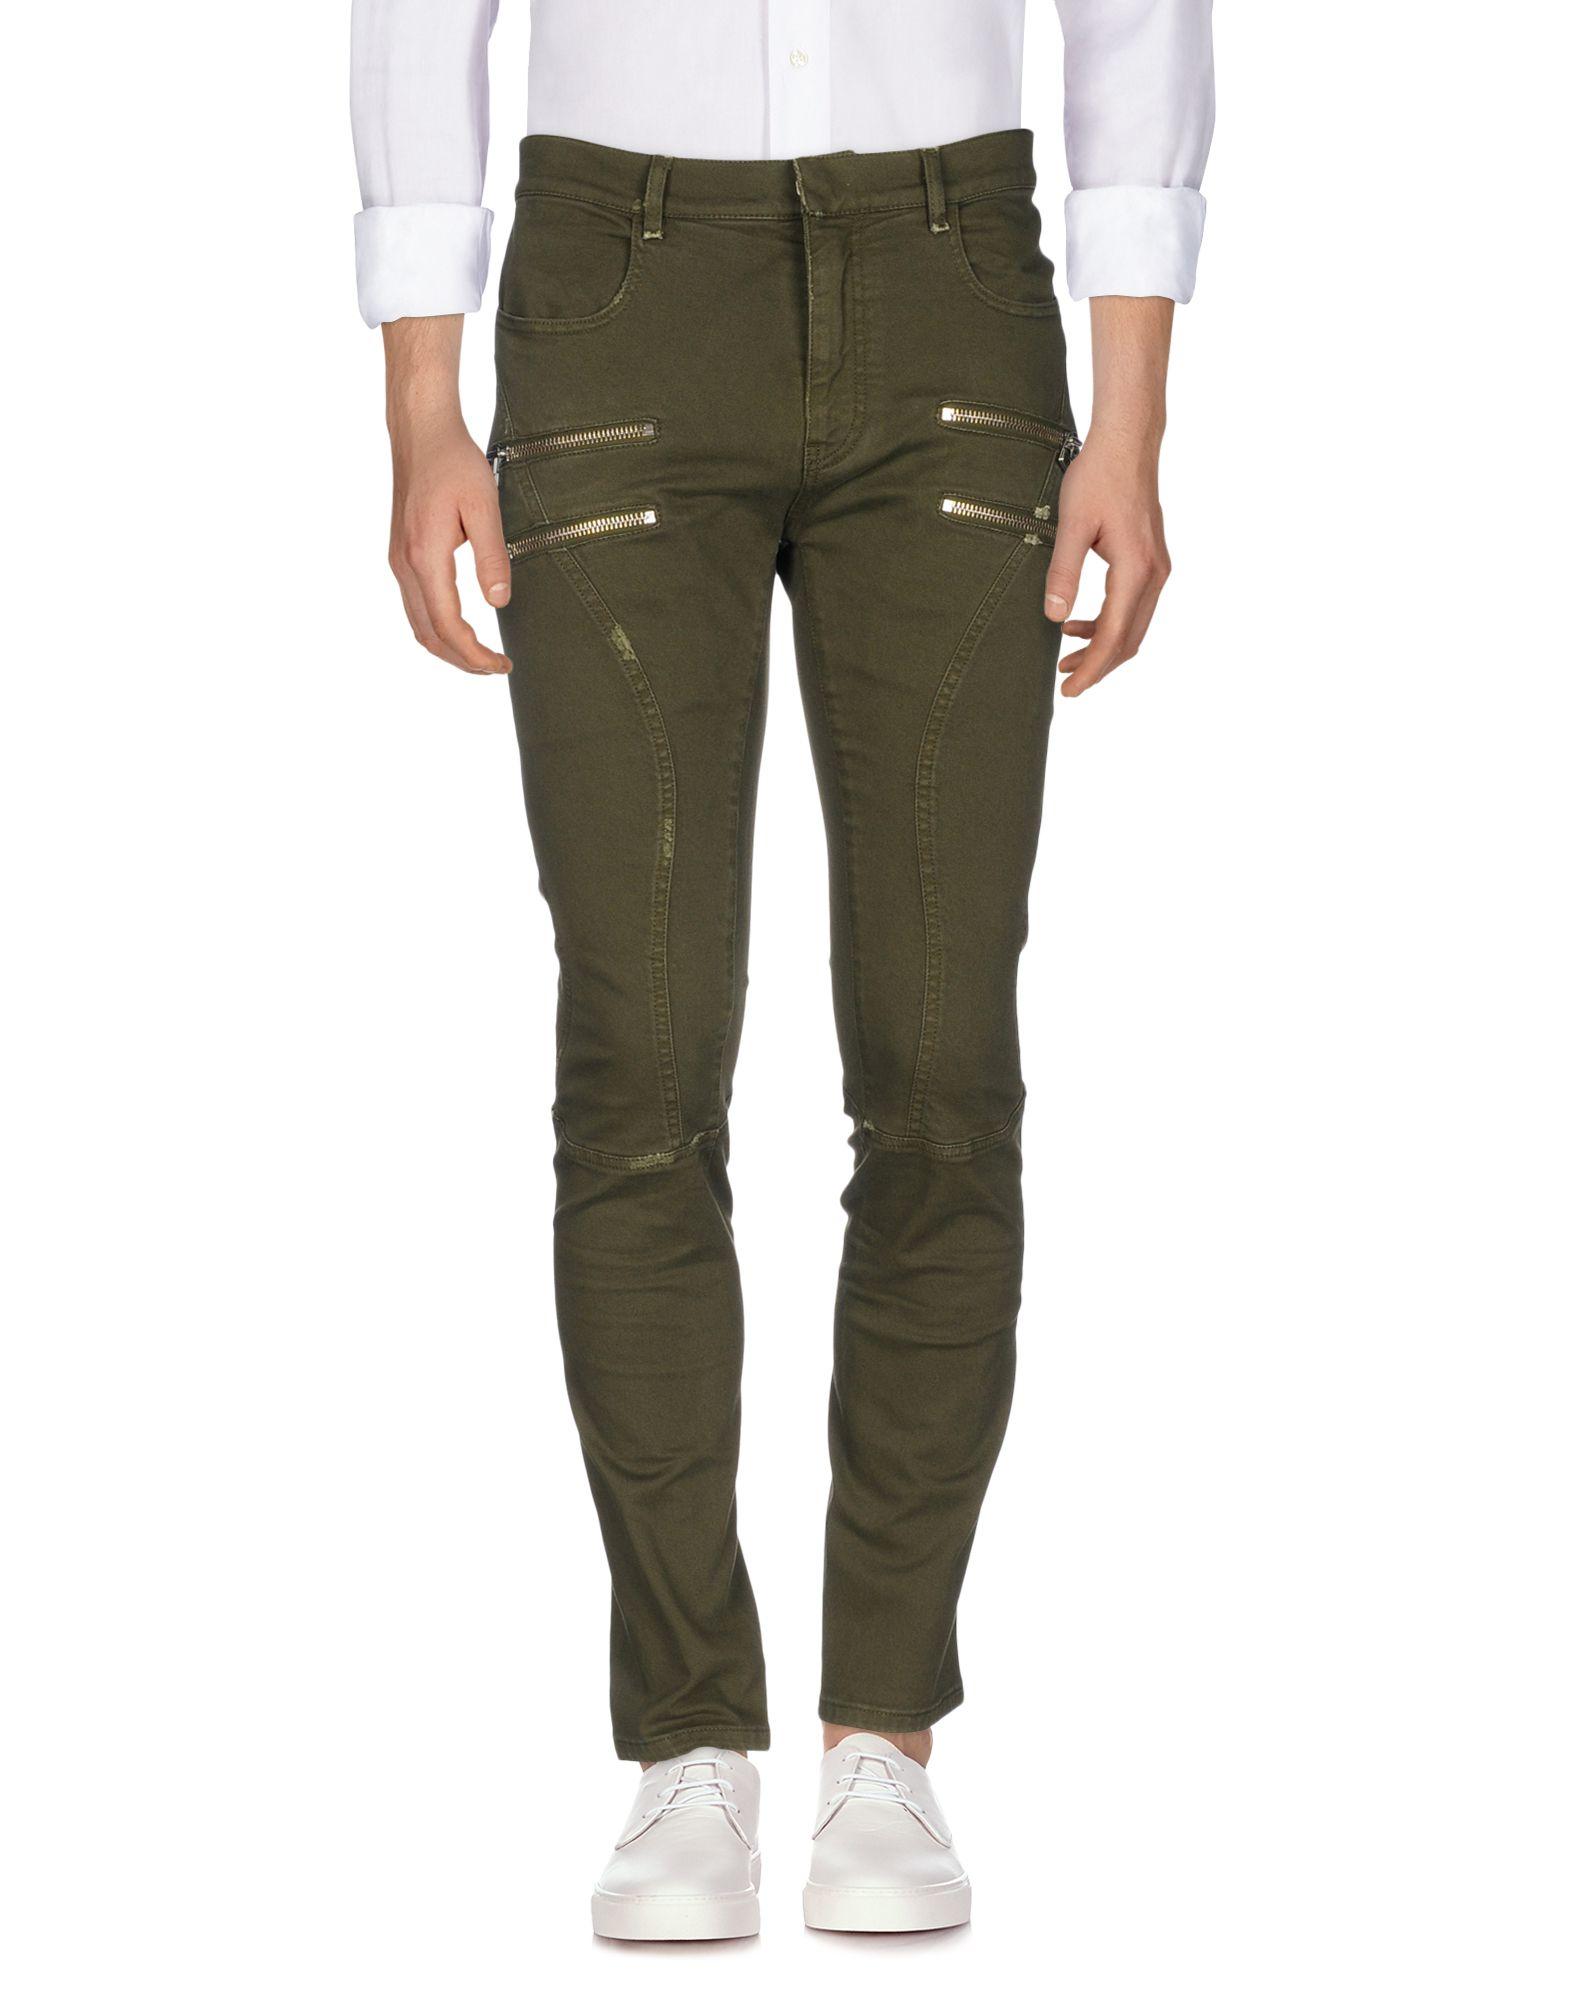 Pantaloni Jeans Faith Connexion Uomo - Acquista online su